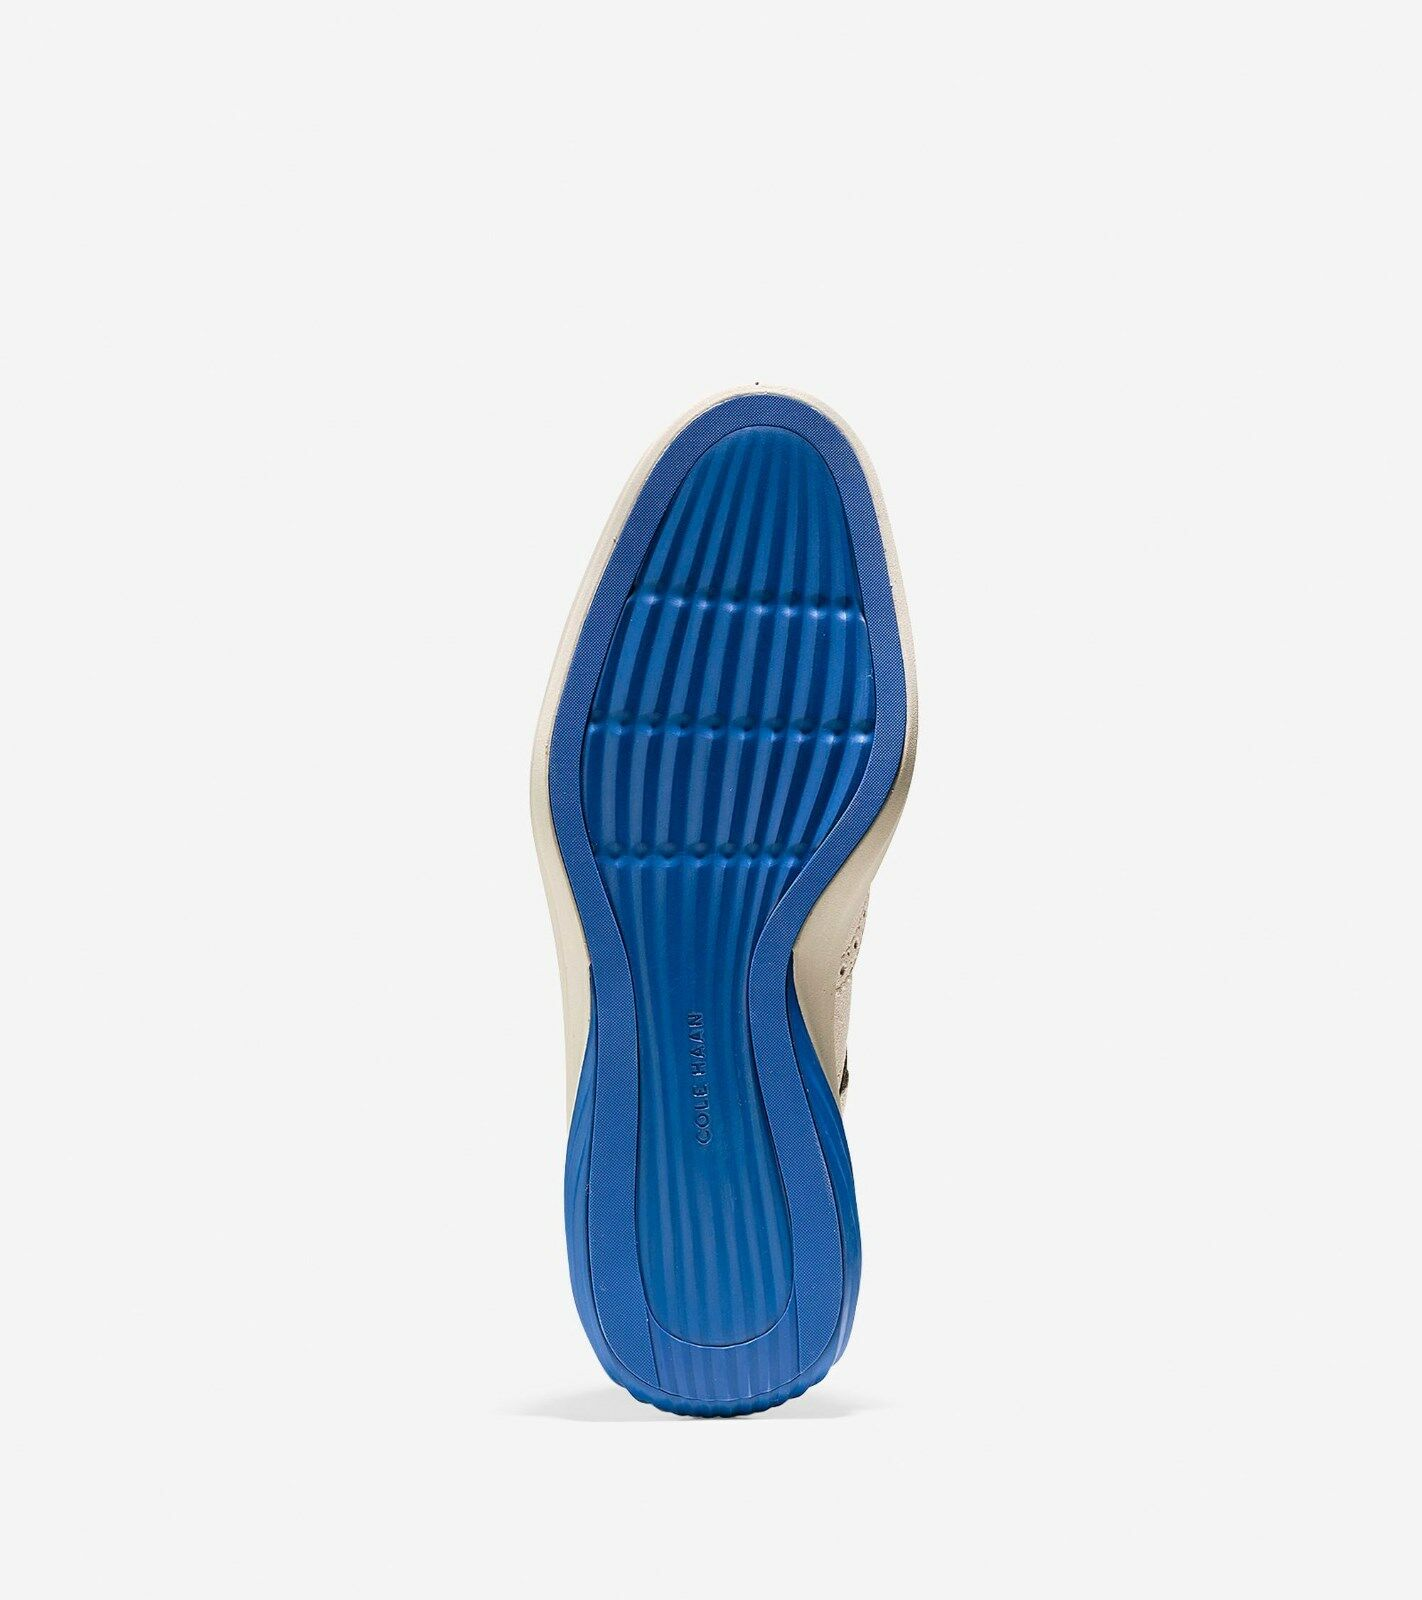 COLE HAAN grand evolution c26311 Pumice Stone Wingtip Suede blue Wingtip Stone Oxford c8b41e